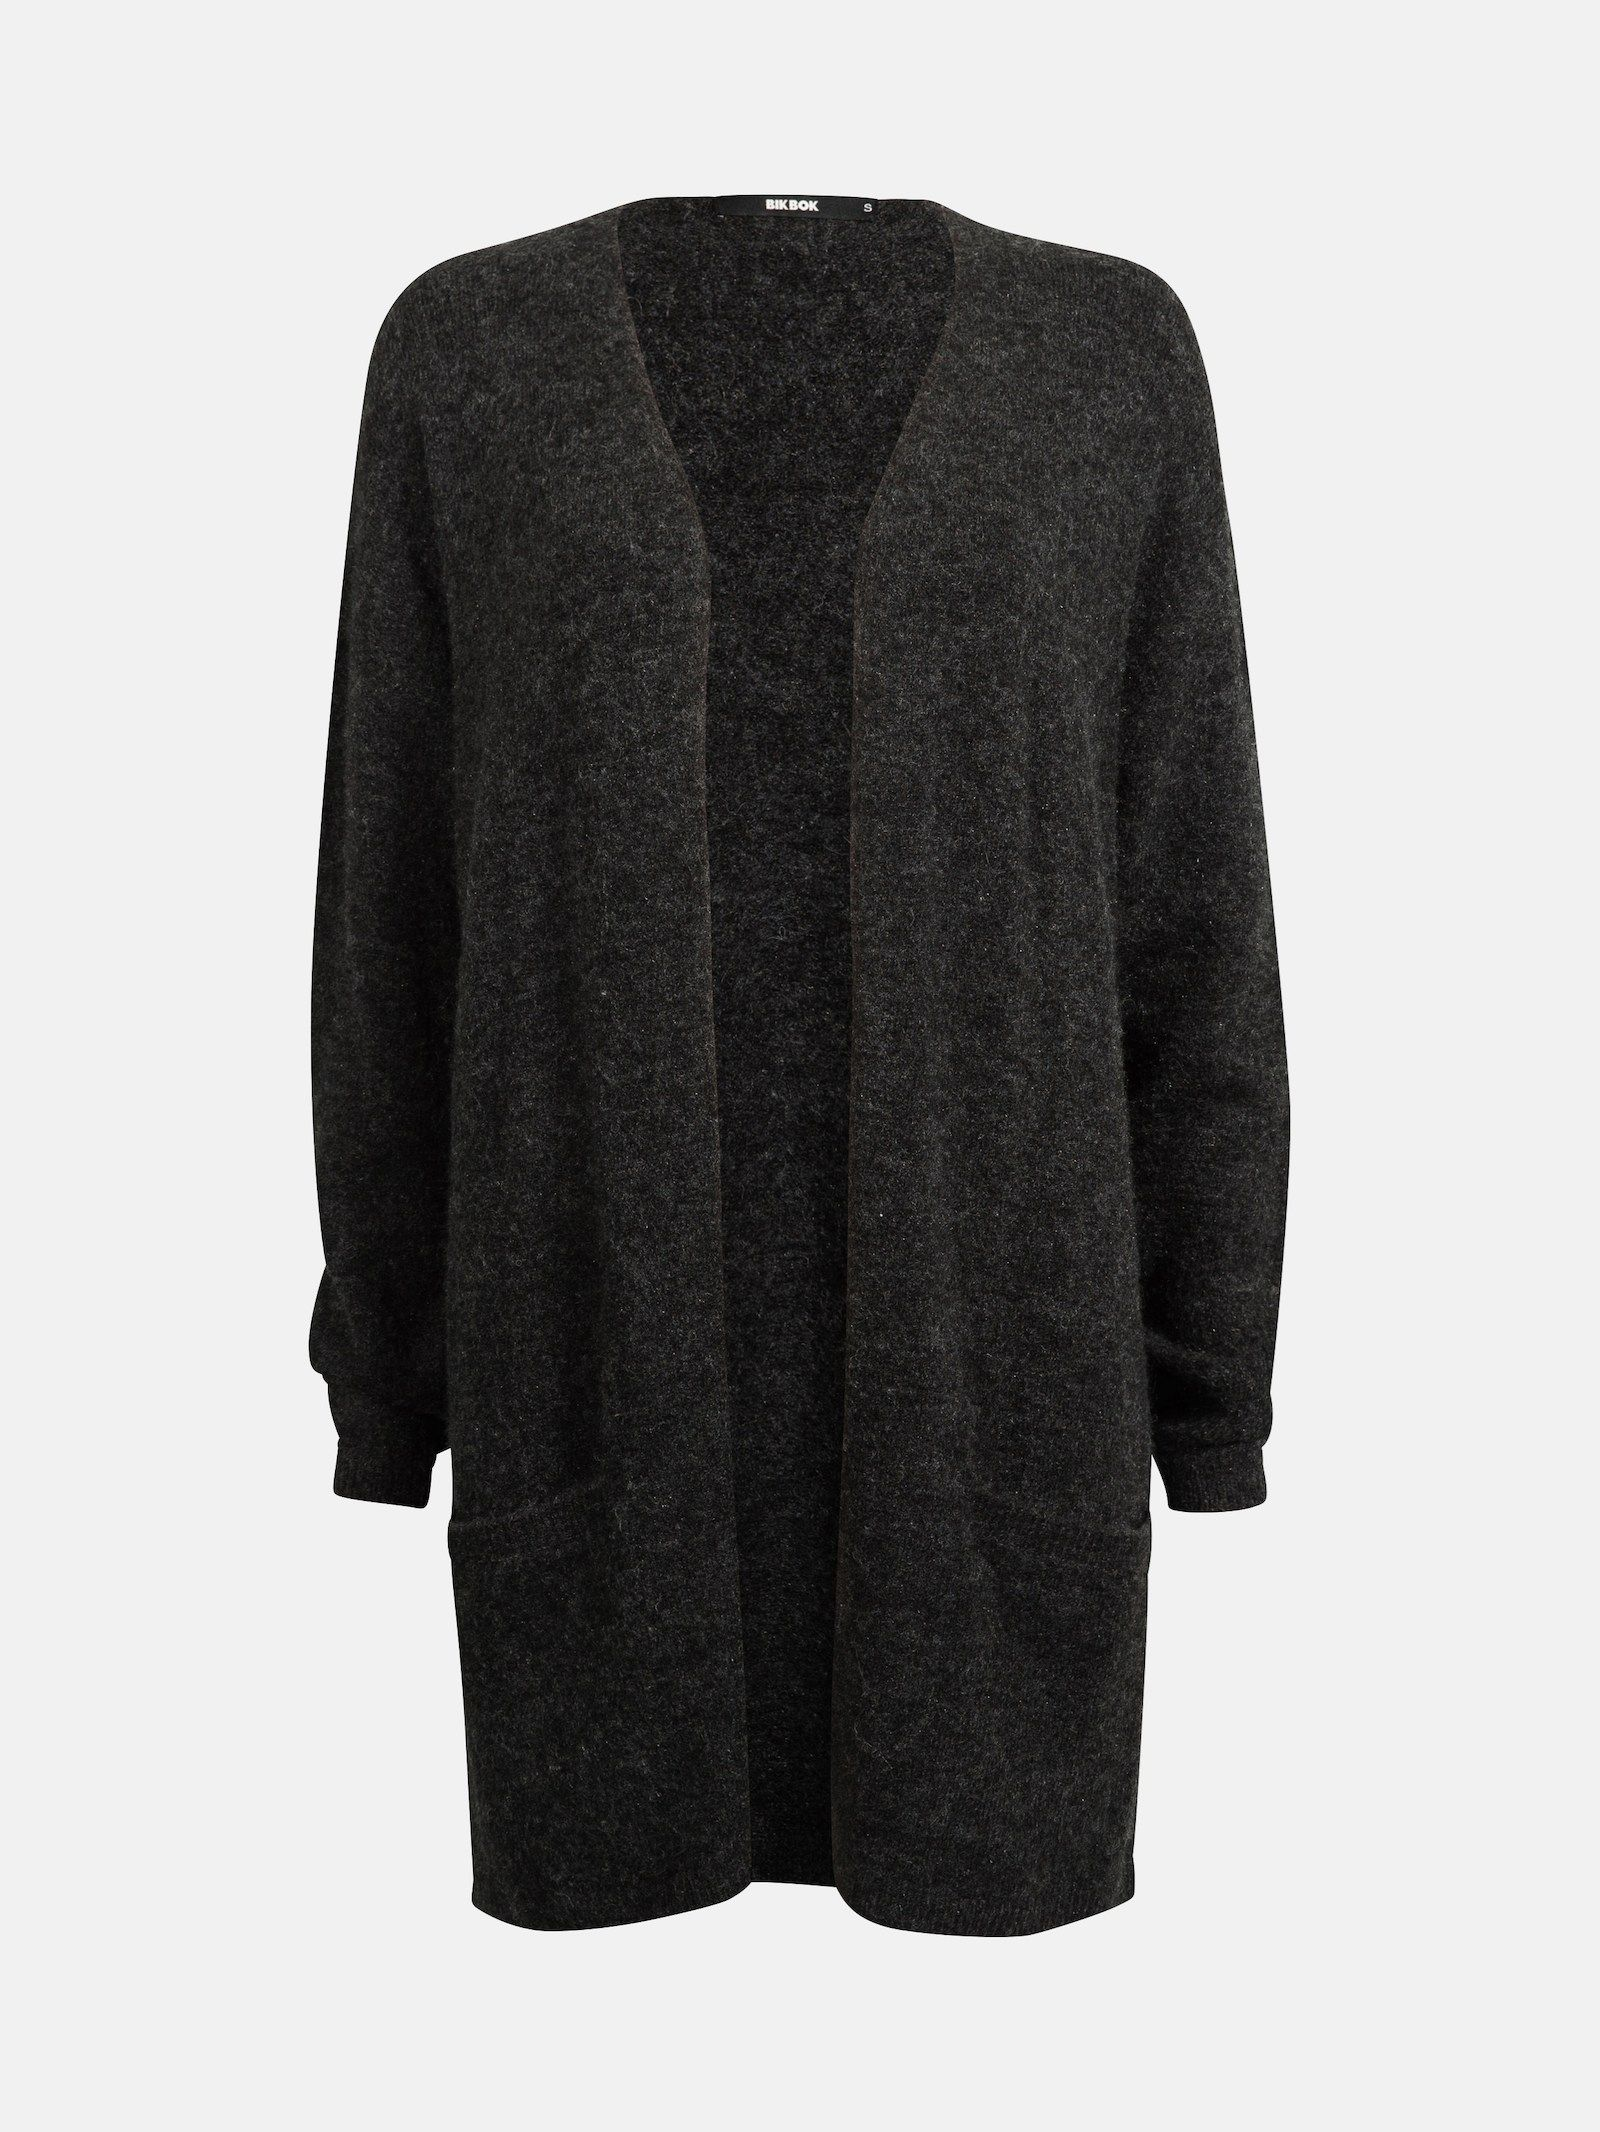 Smilla cardigan | 7171582 | Sort | BikBok | Norge